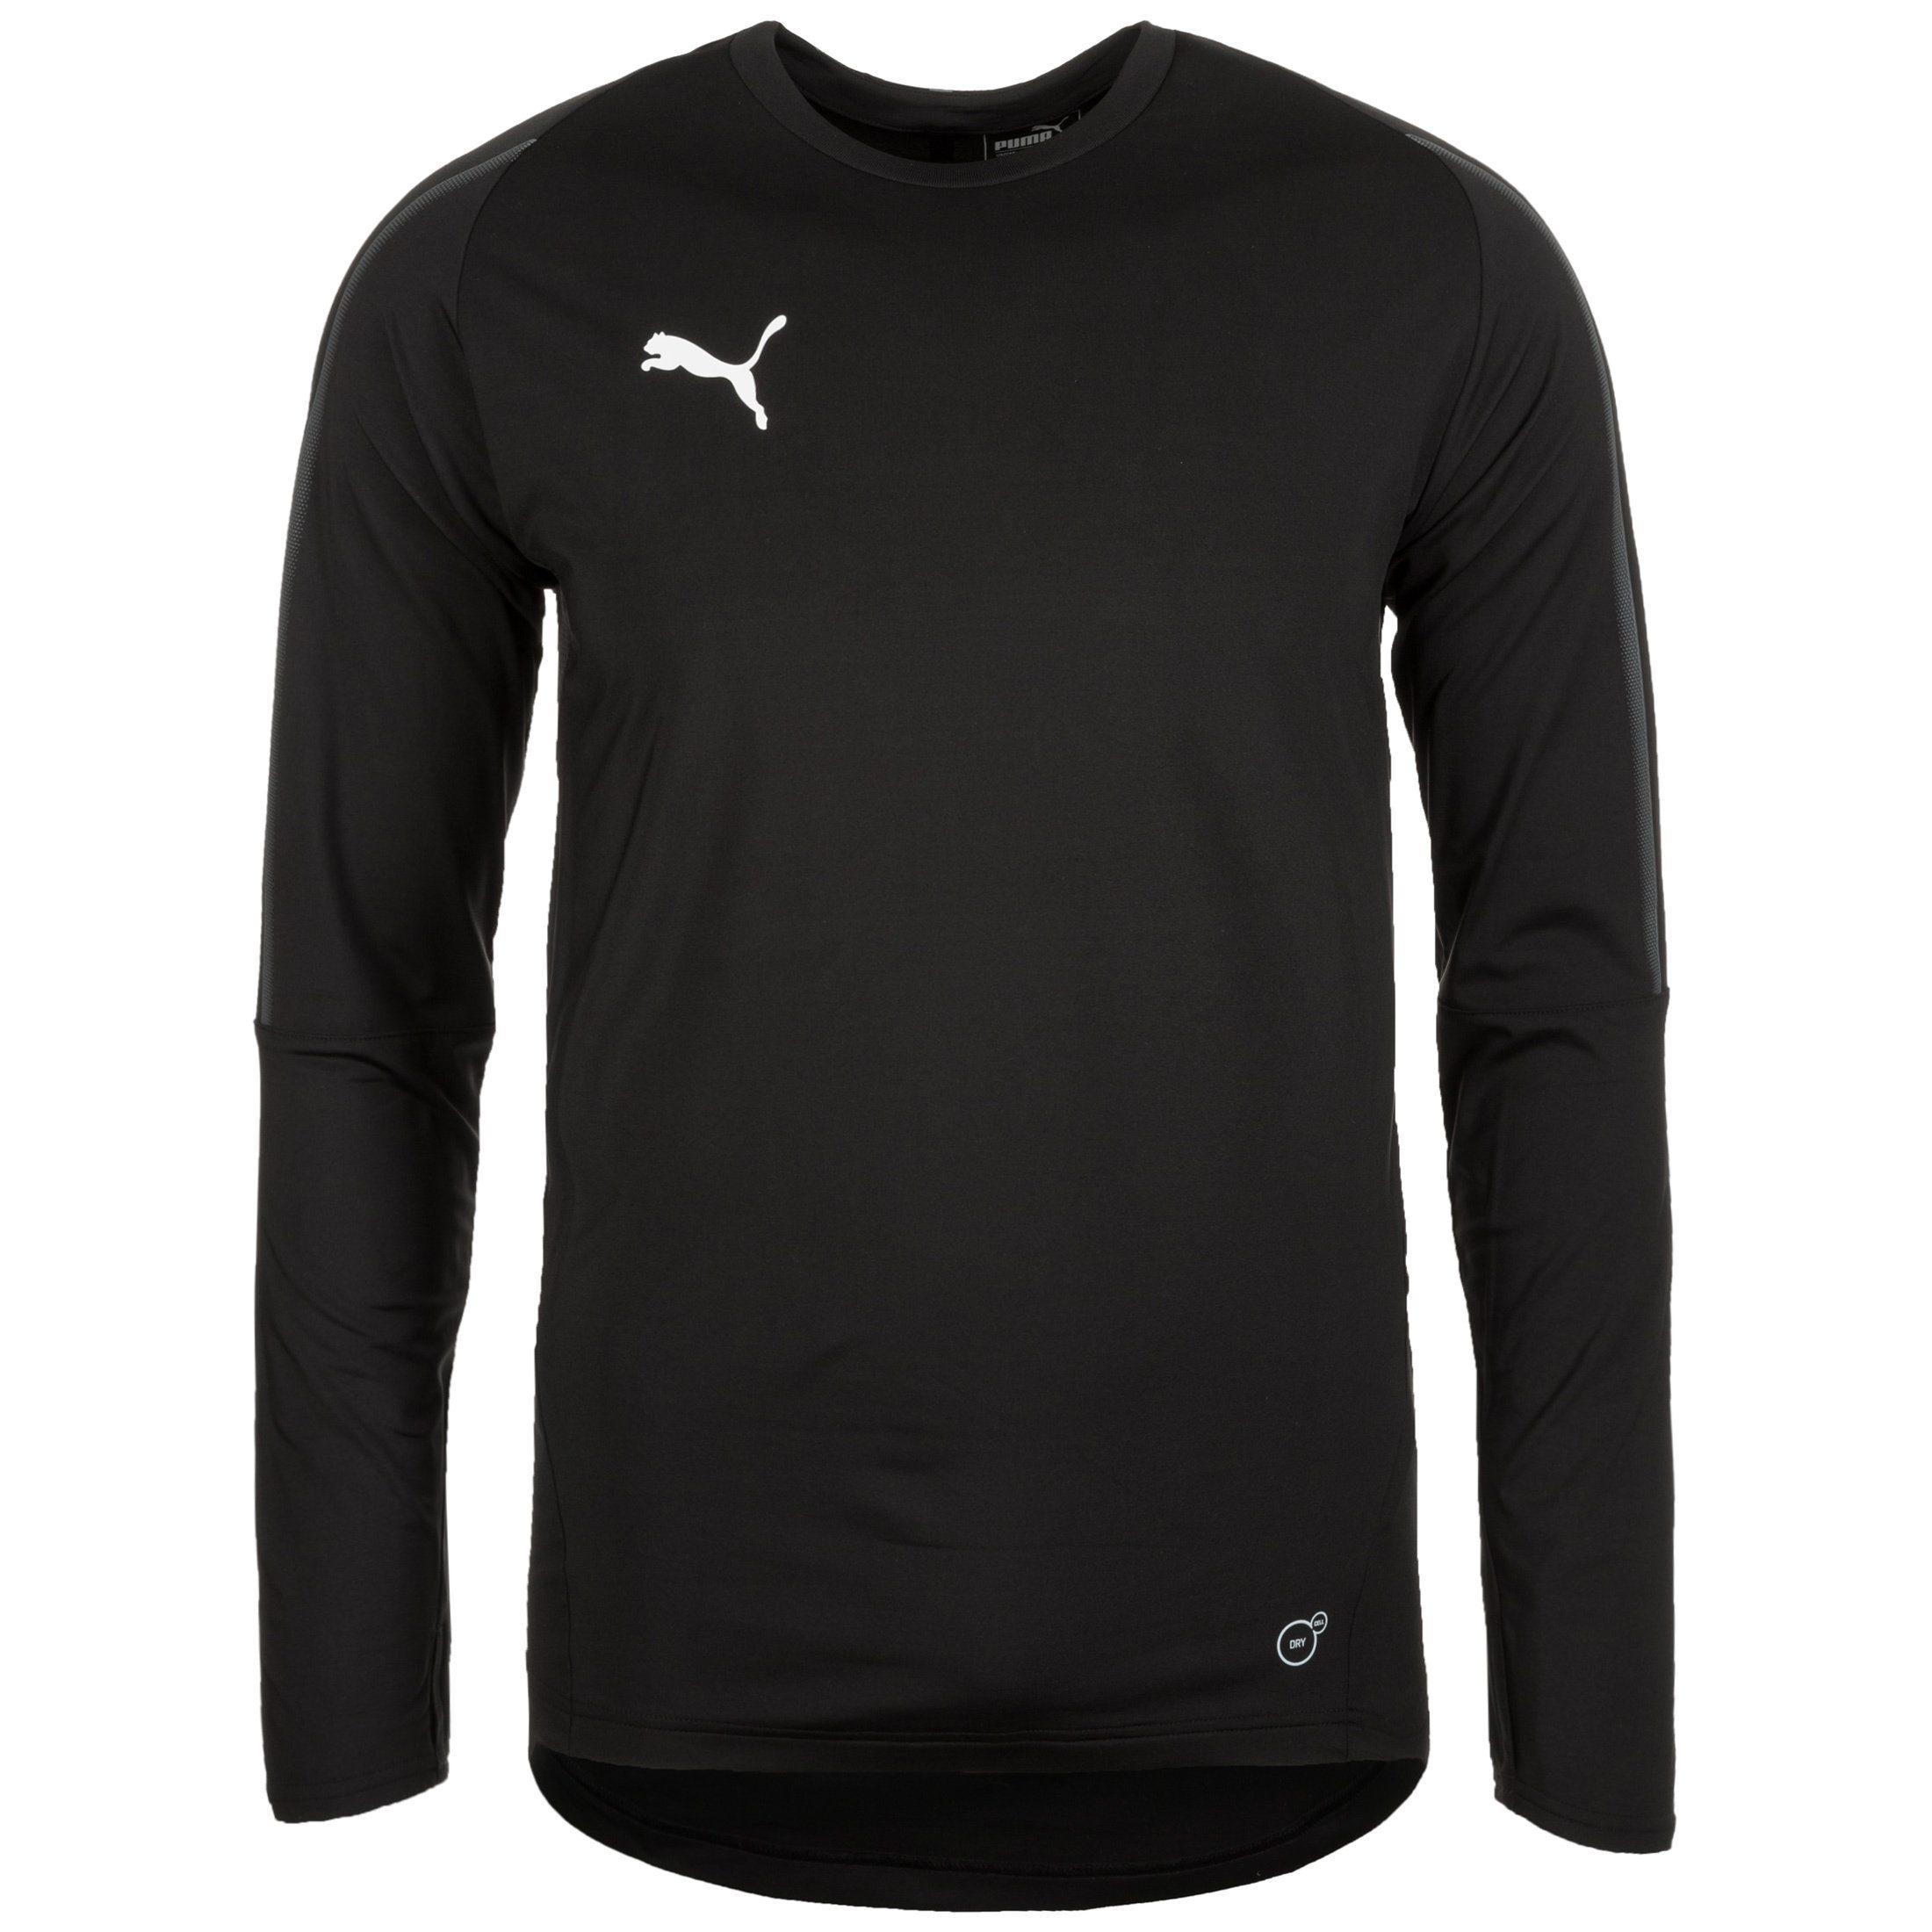 PUMA Longsleeve »Final« | Bekleidung > Shirts > Langarm Shirts | Schwarz | PUMA